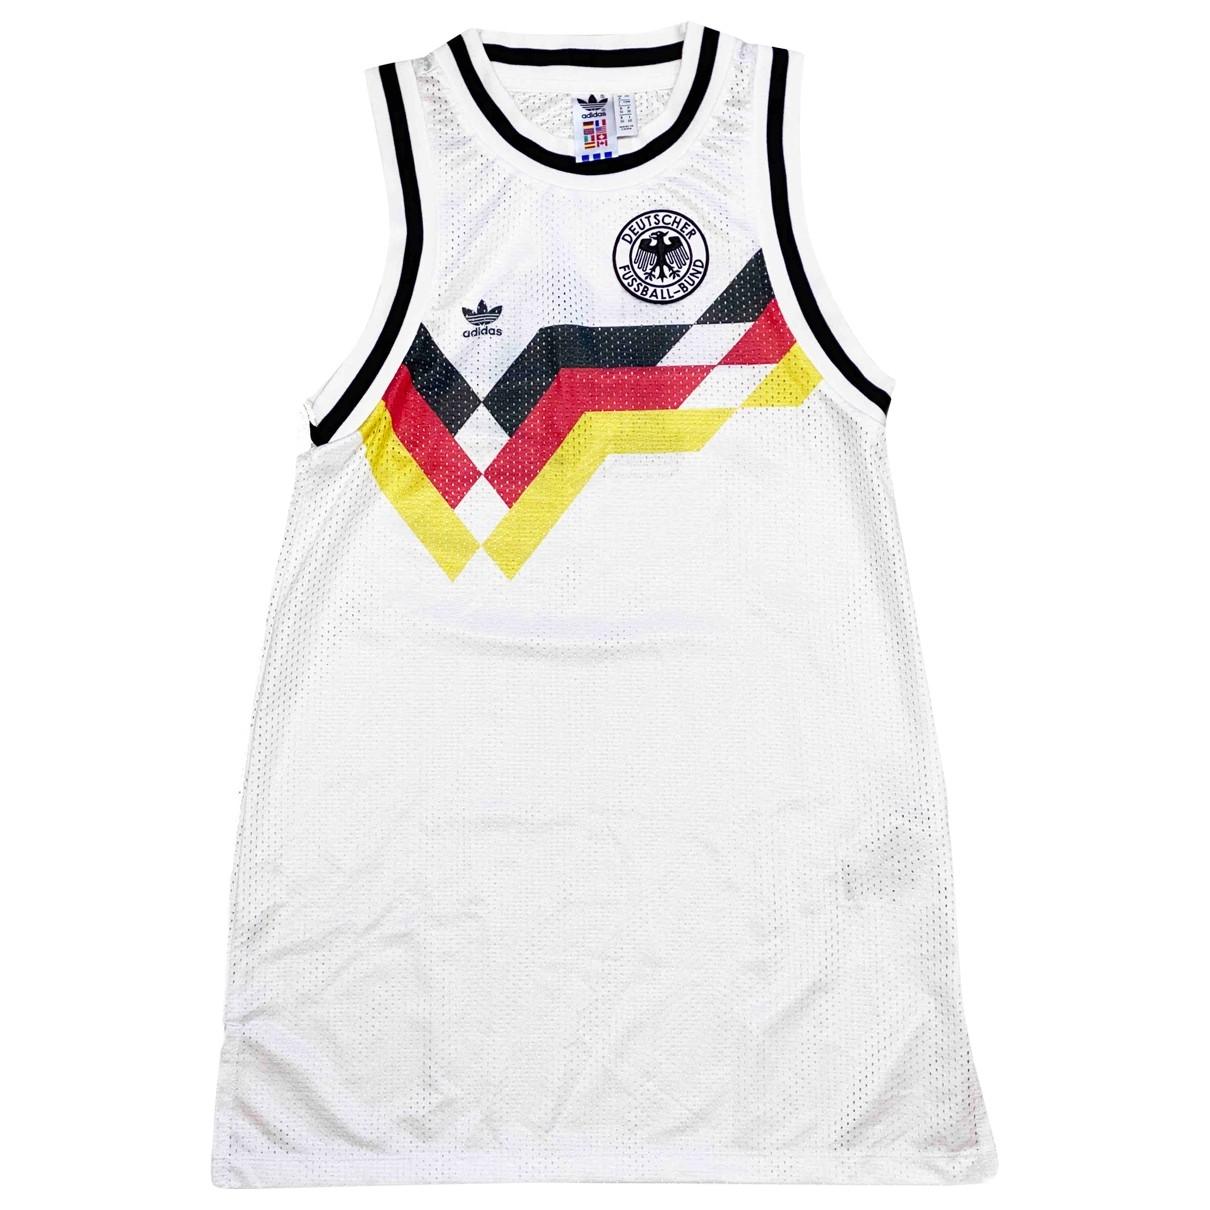 Adidas - Robe   pour femme - multicolore